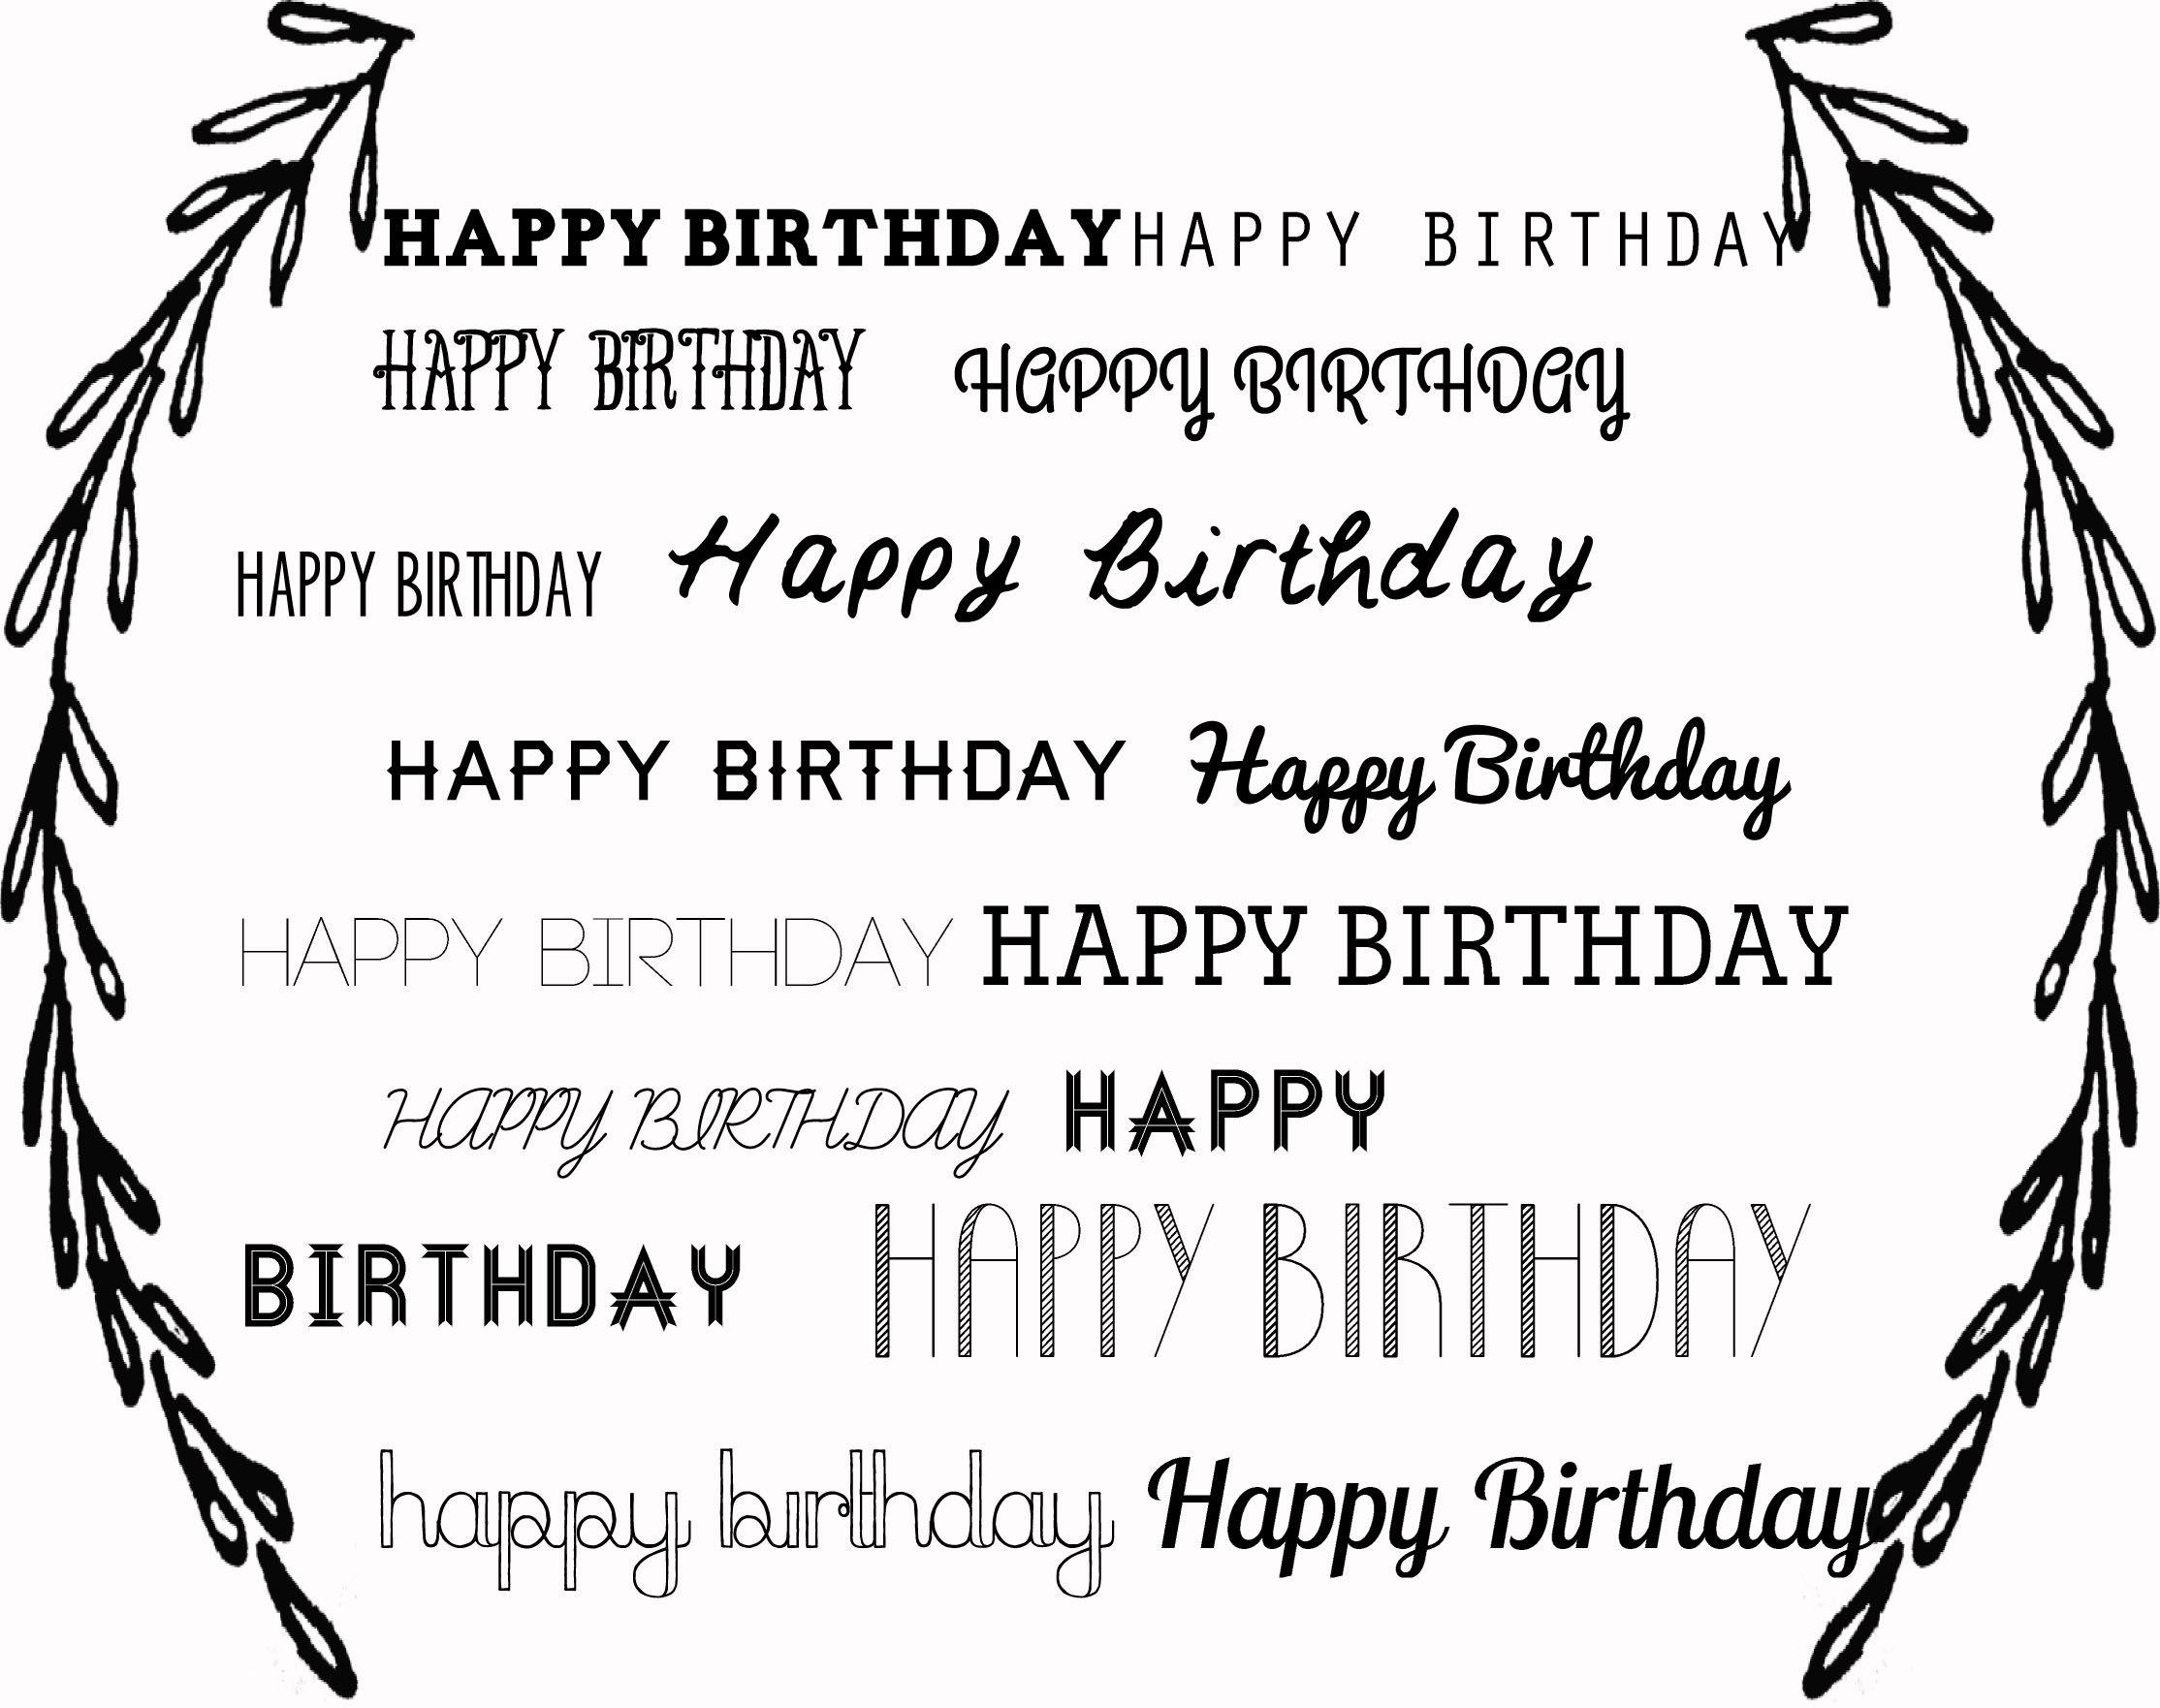 Happy birthday card font pinterest happy birthday cards and happy birthday card kristyandbryce Choice Image